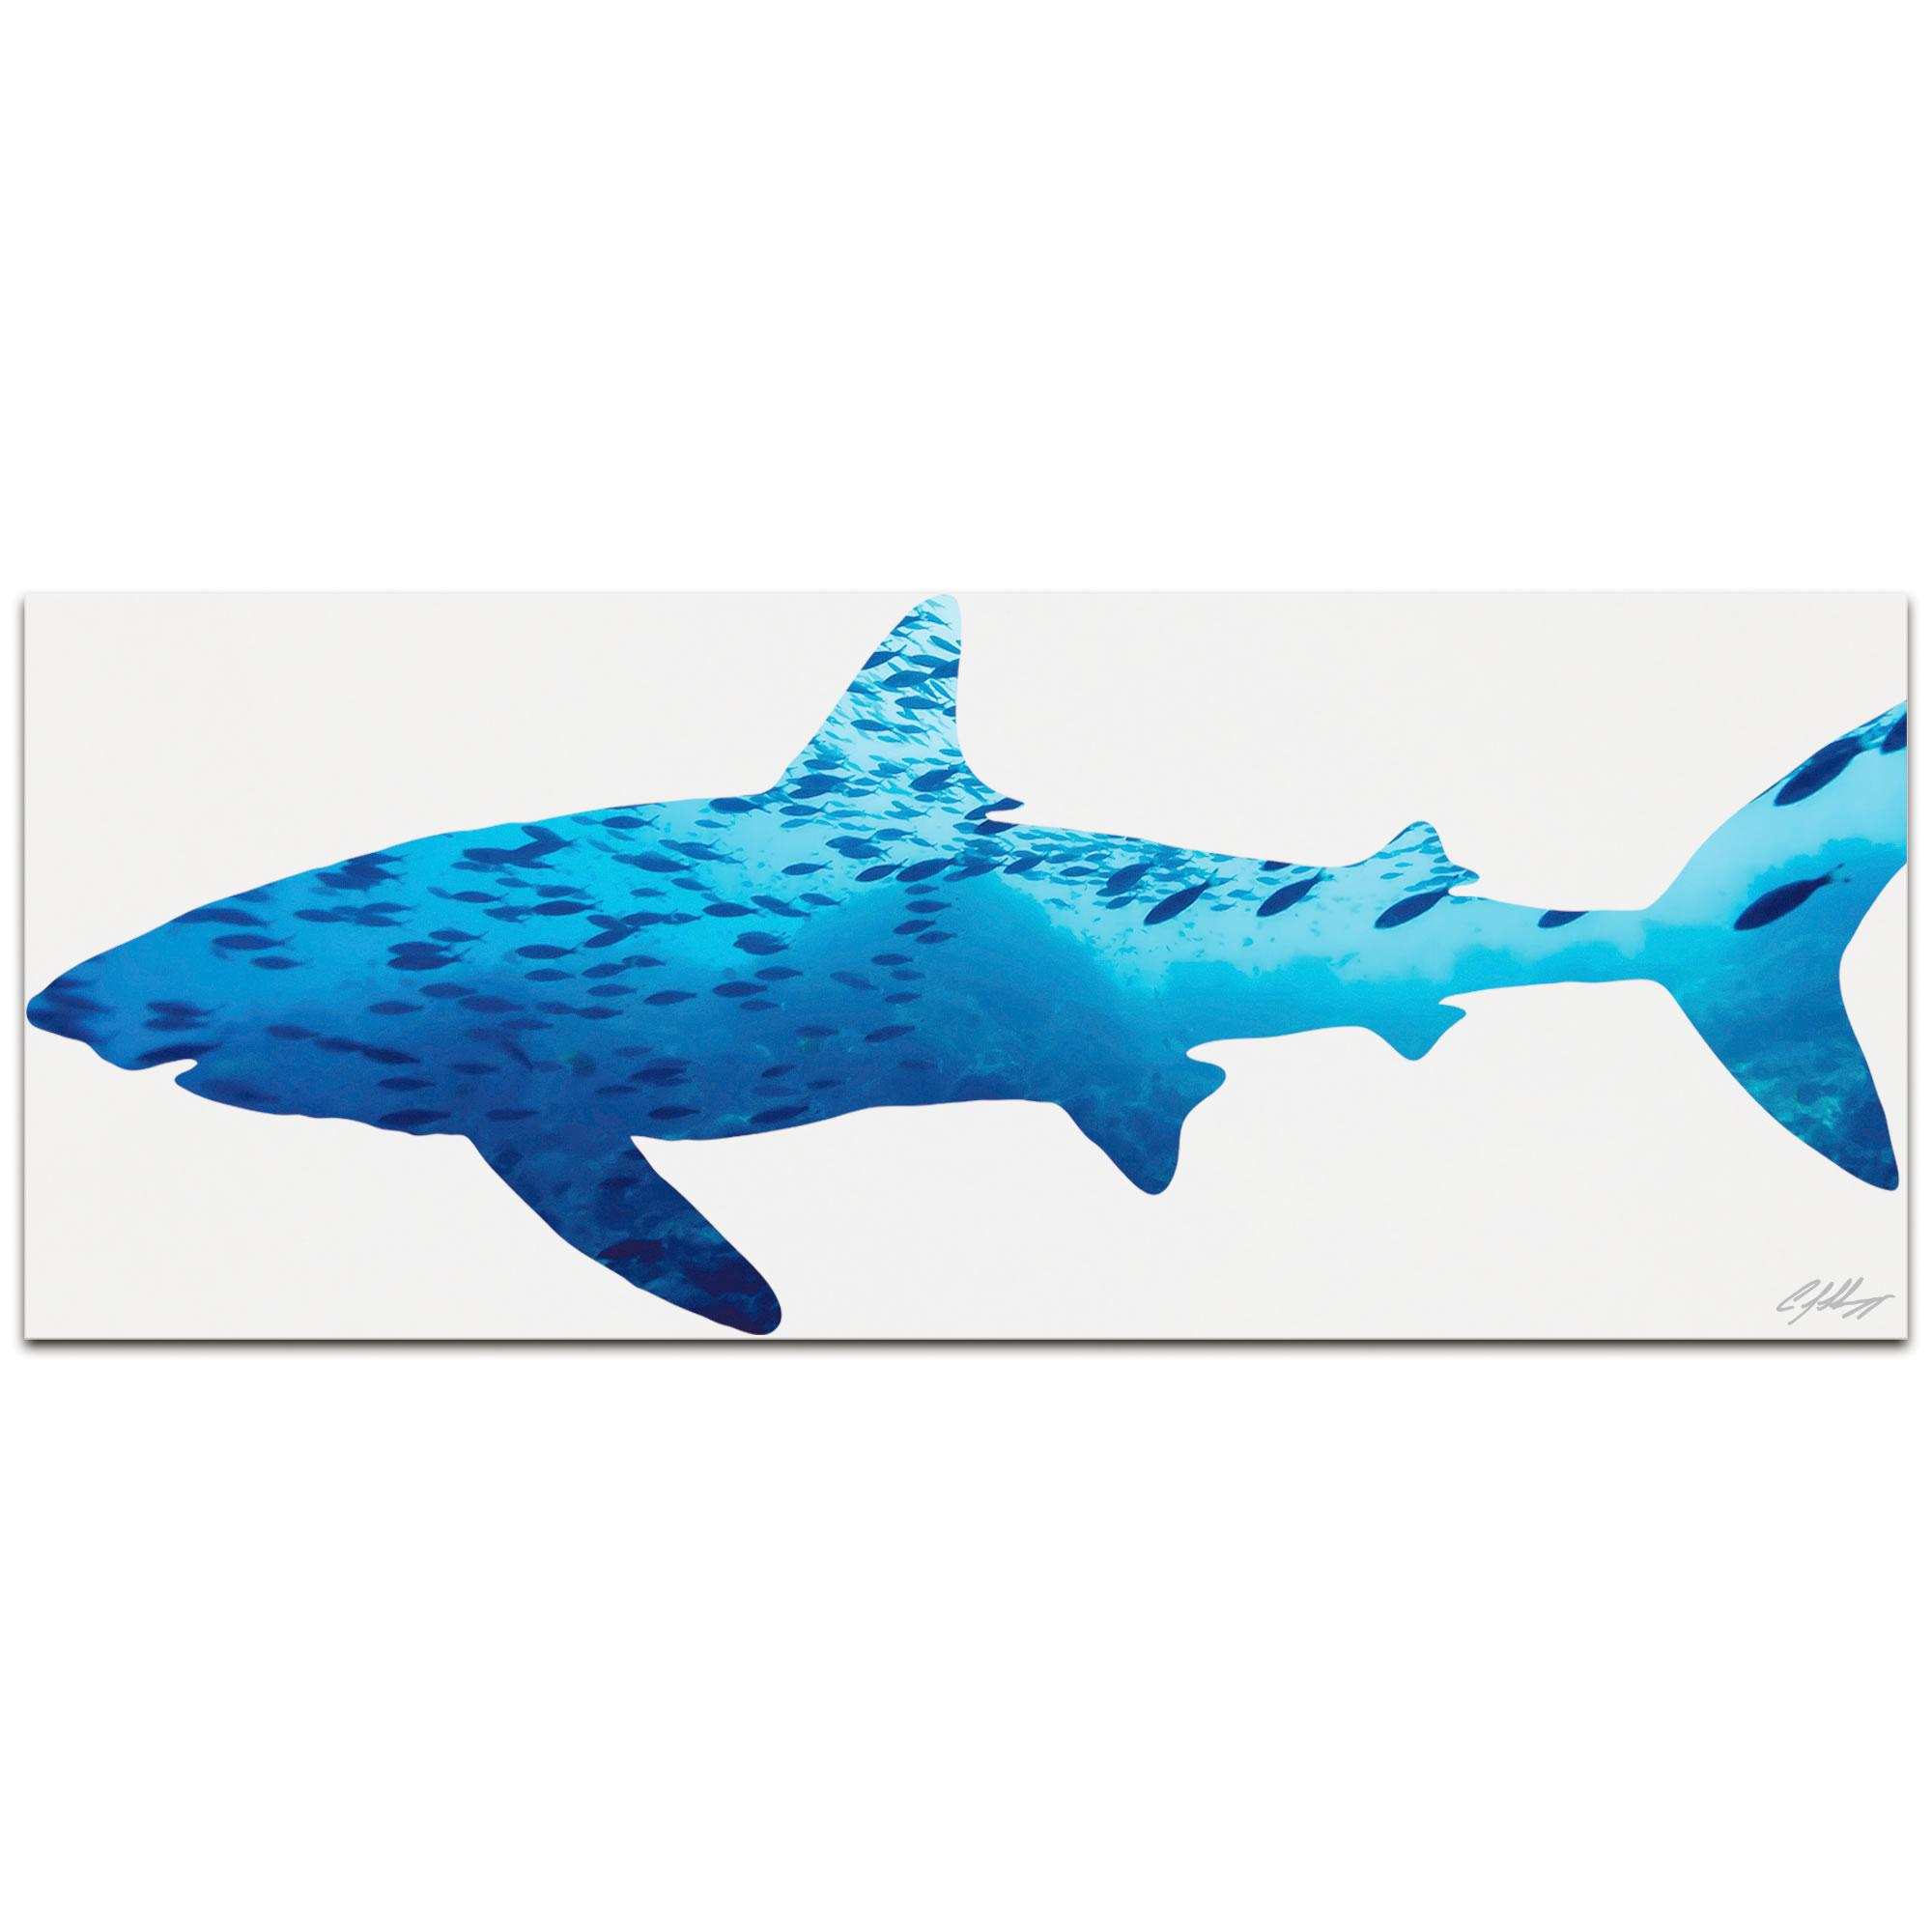 SHARK SEASCAPE - 48x19 in. Metal Animal Print